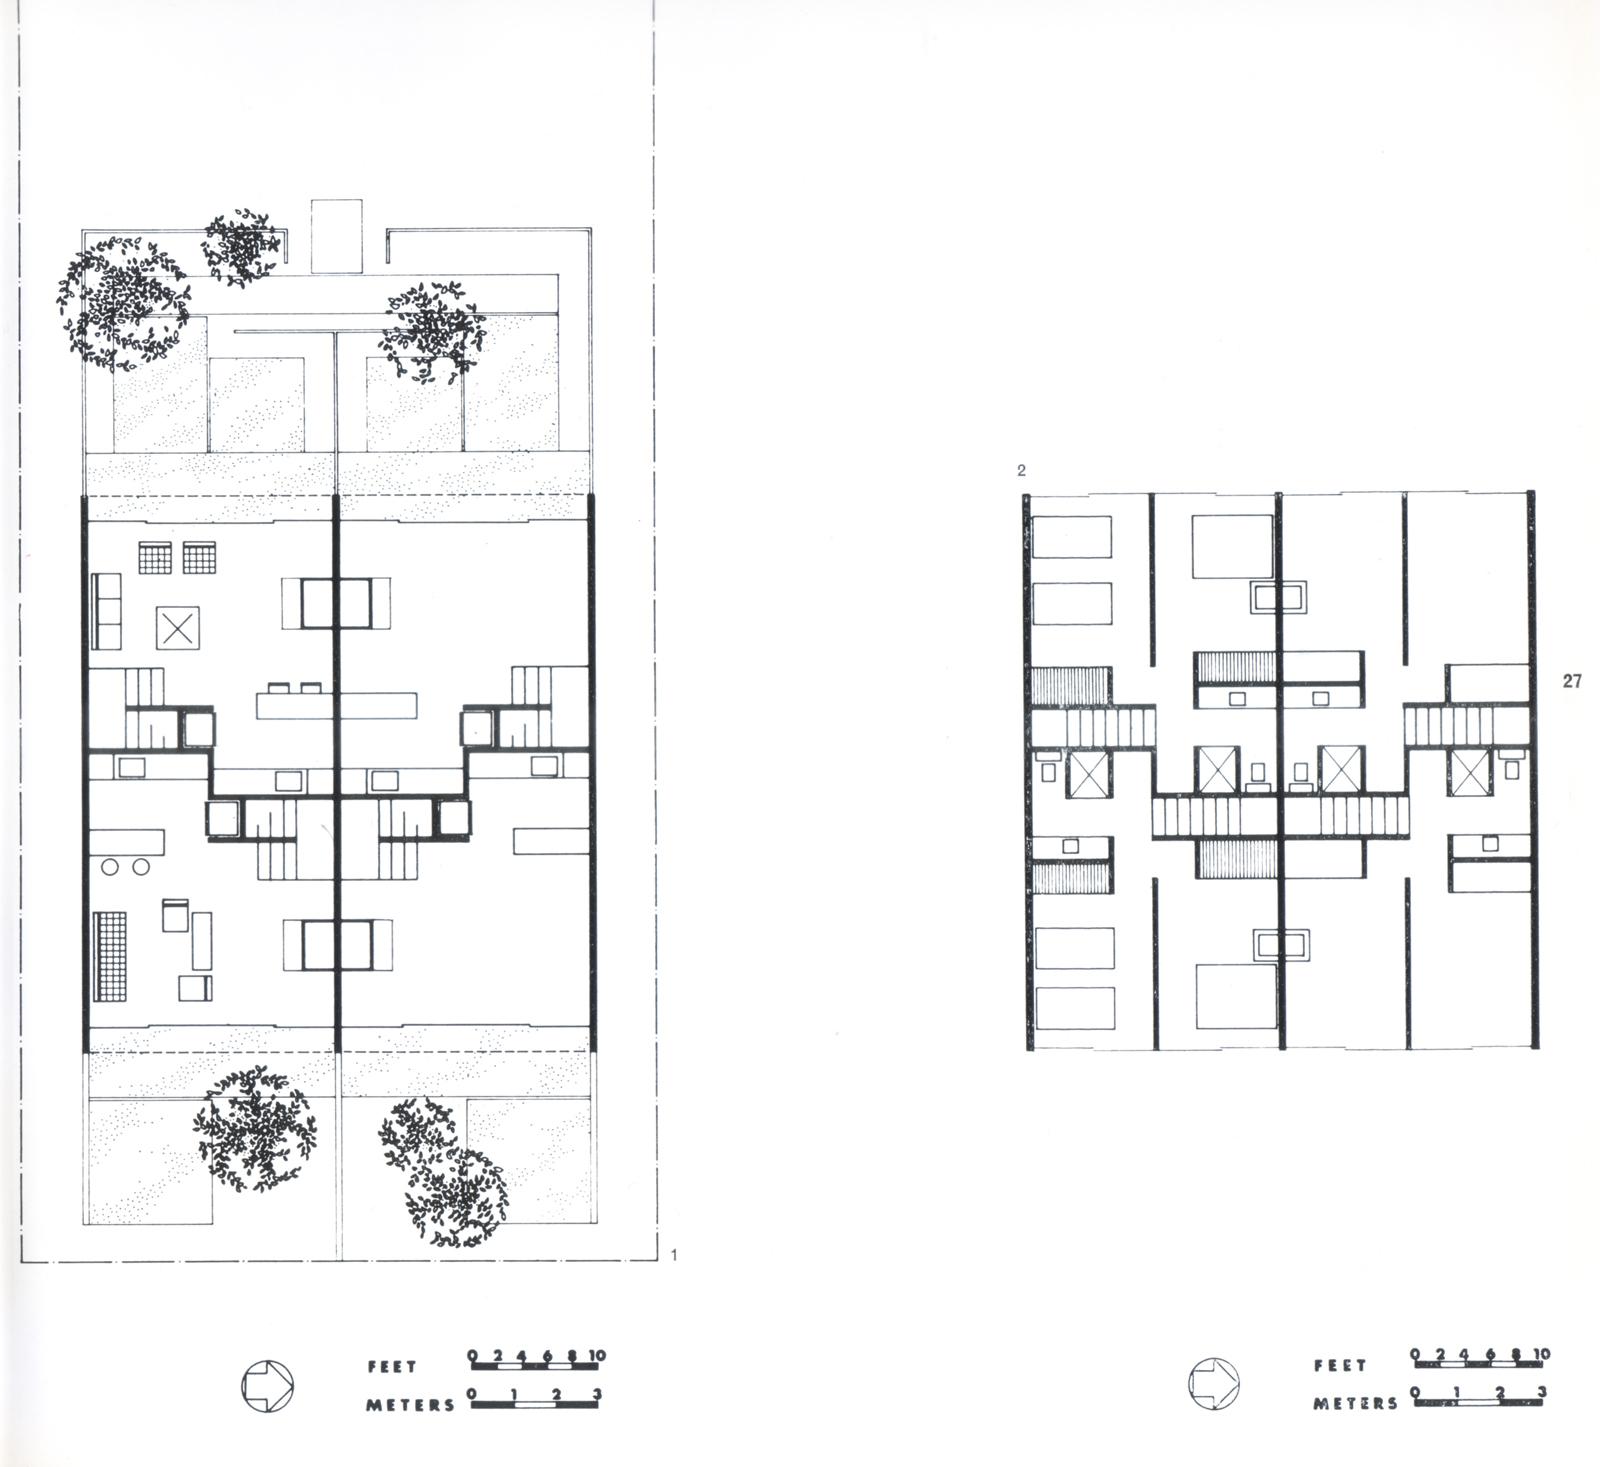 Original 1952 plan of the building.